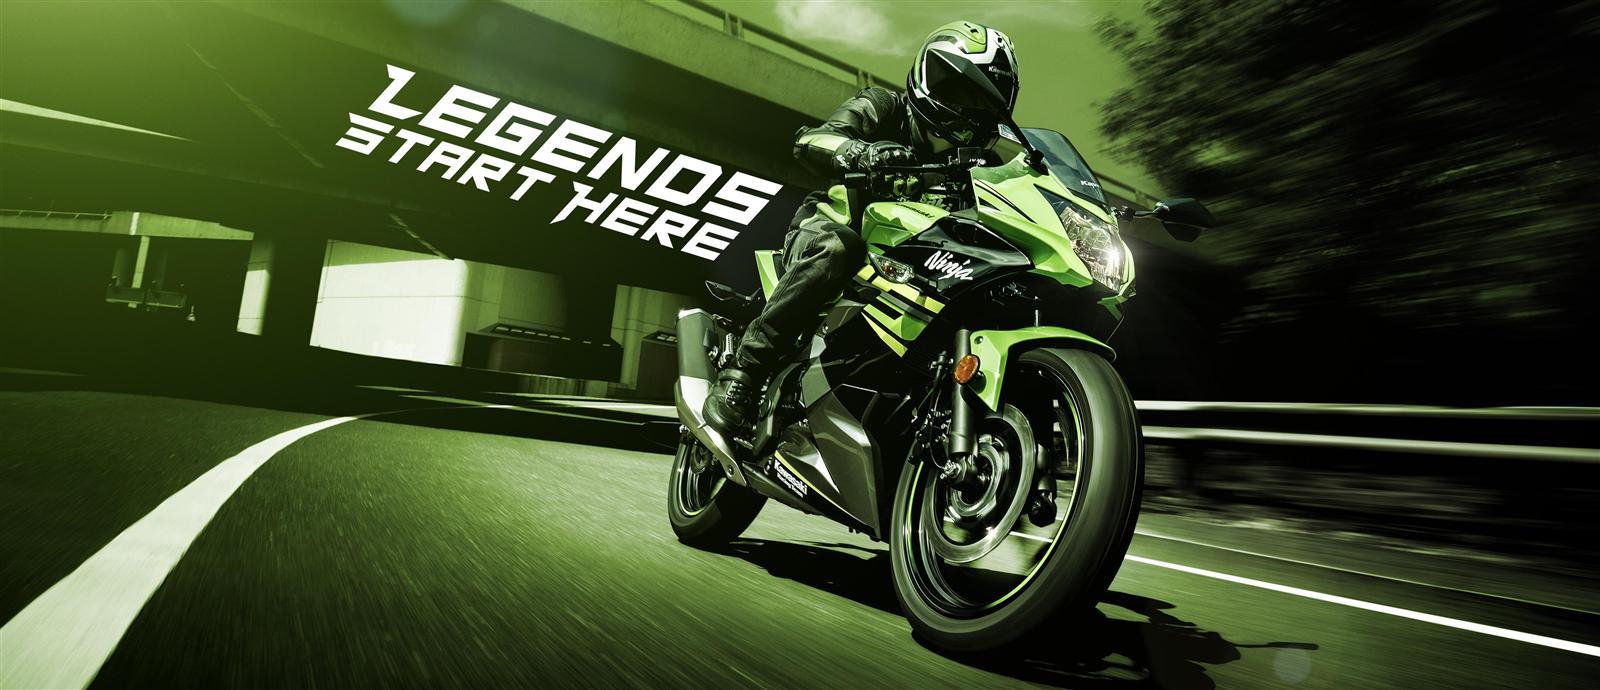 Ninja 125 My 2019 Kawasaki Europe